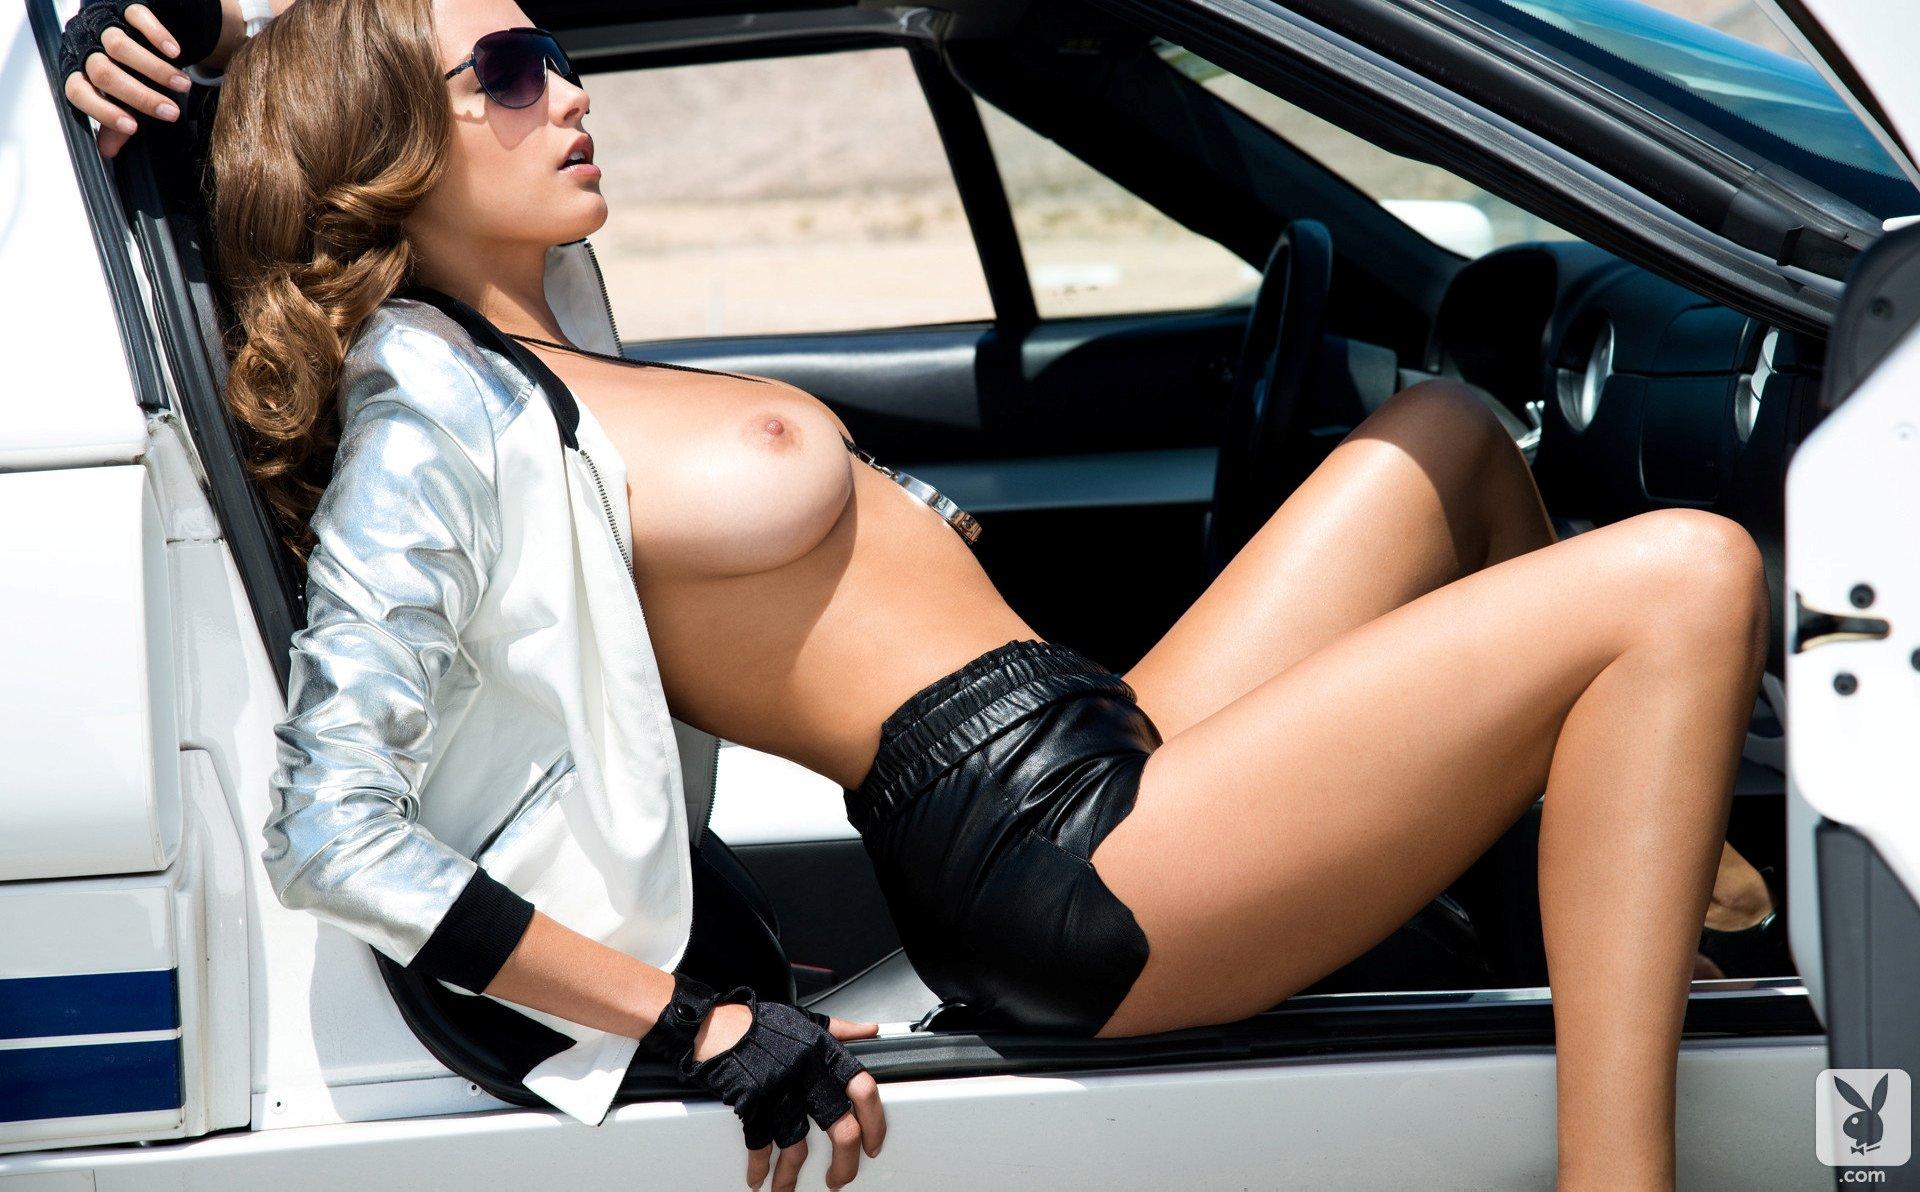 Alyssa Arce Instagram Nude Leaks 0015